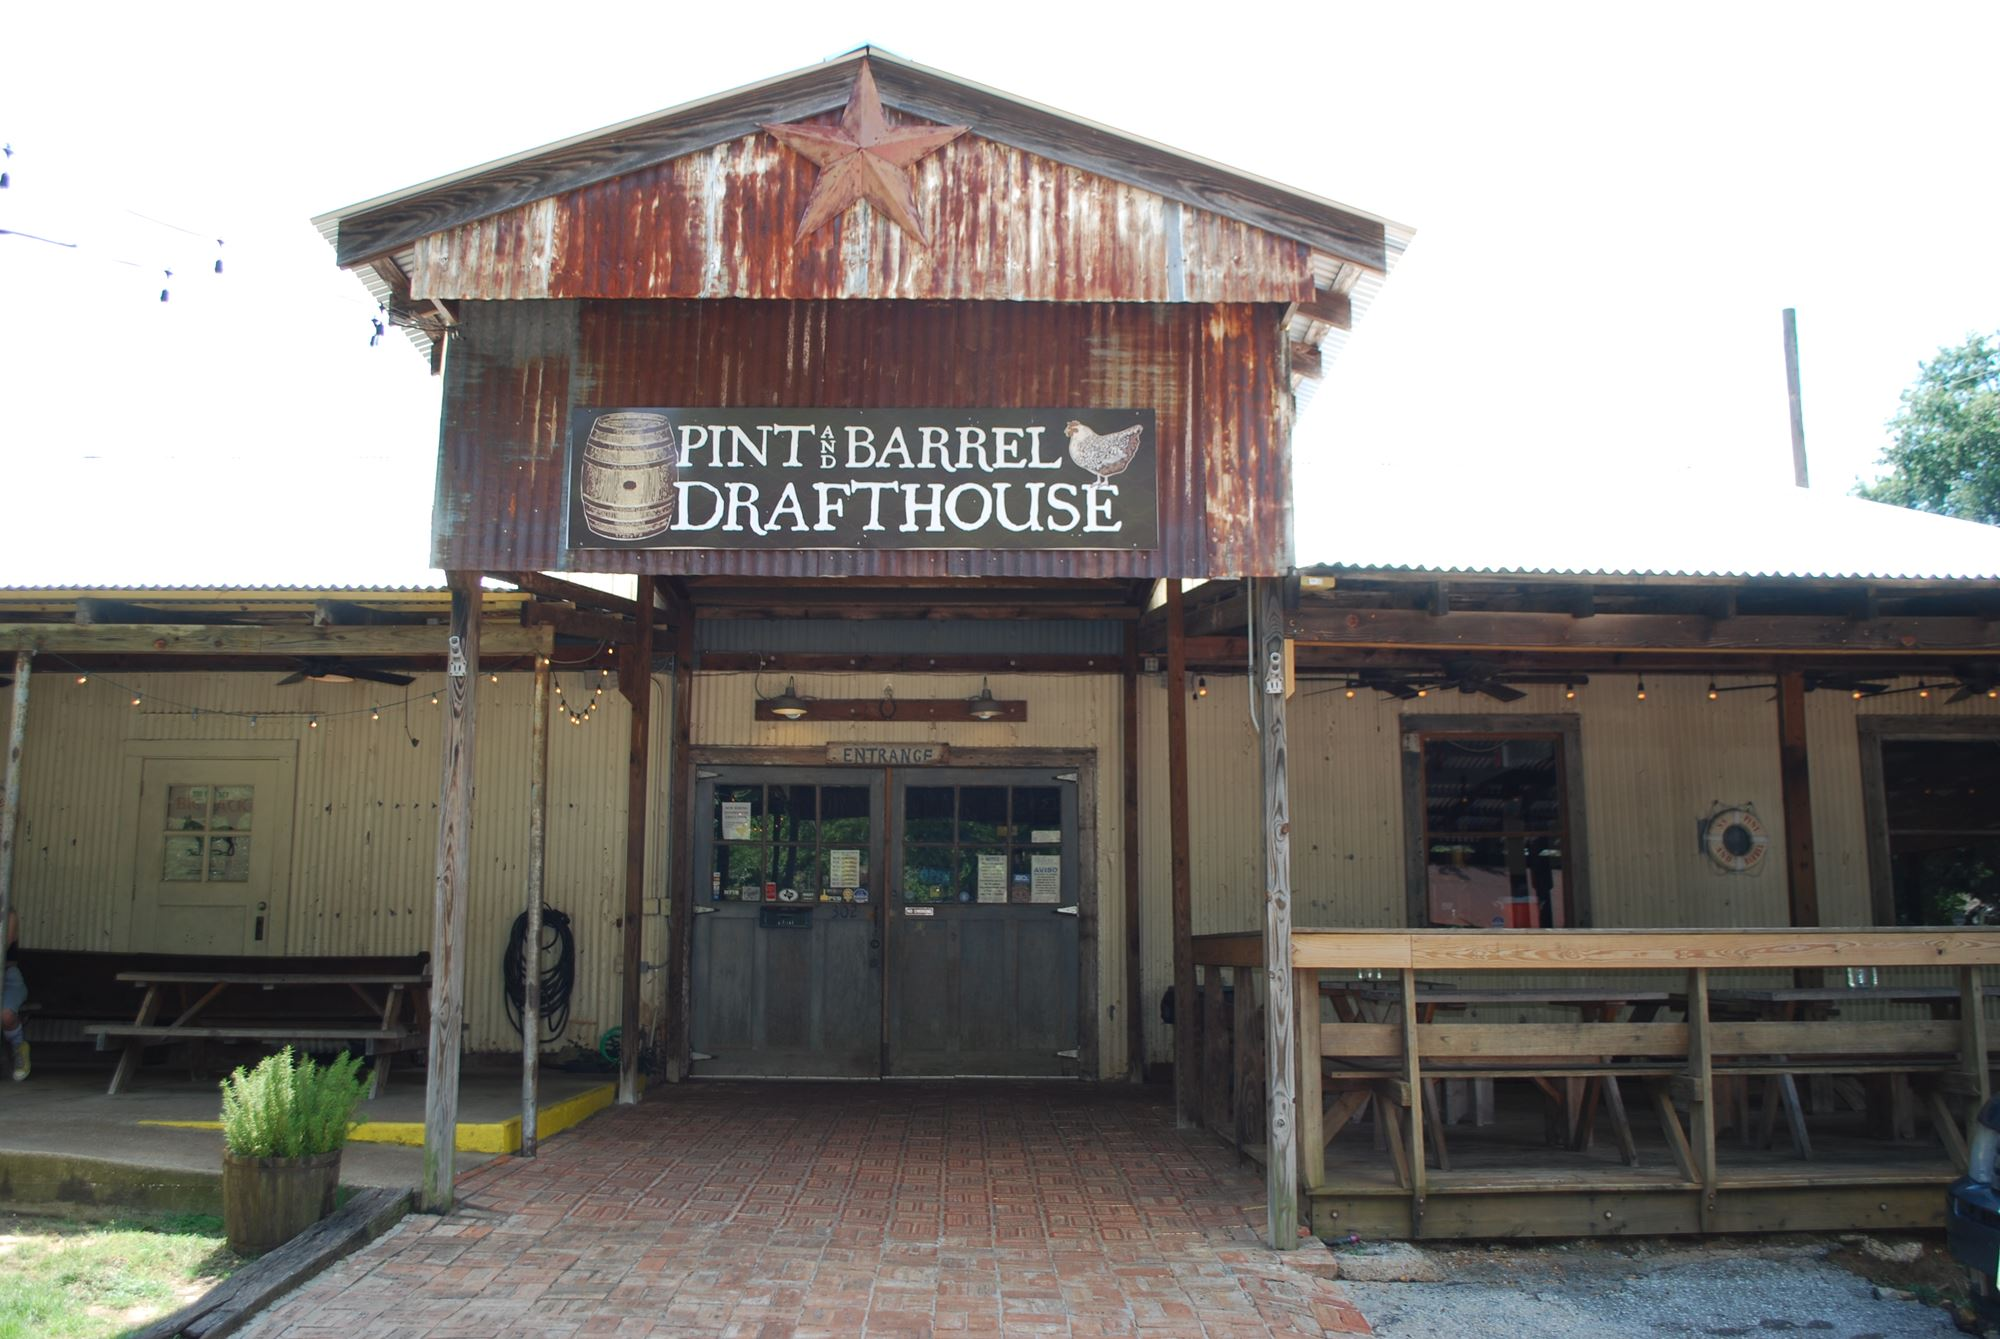 Pint & Barrel Drafthousee